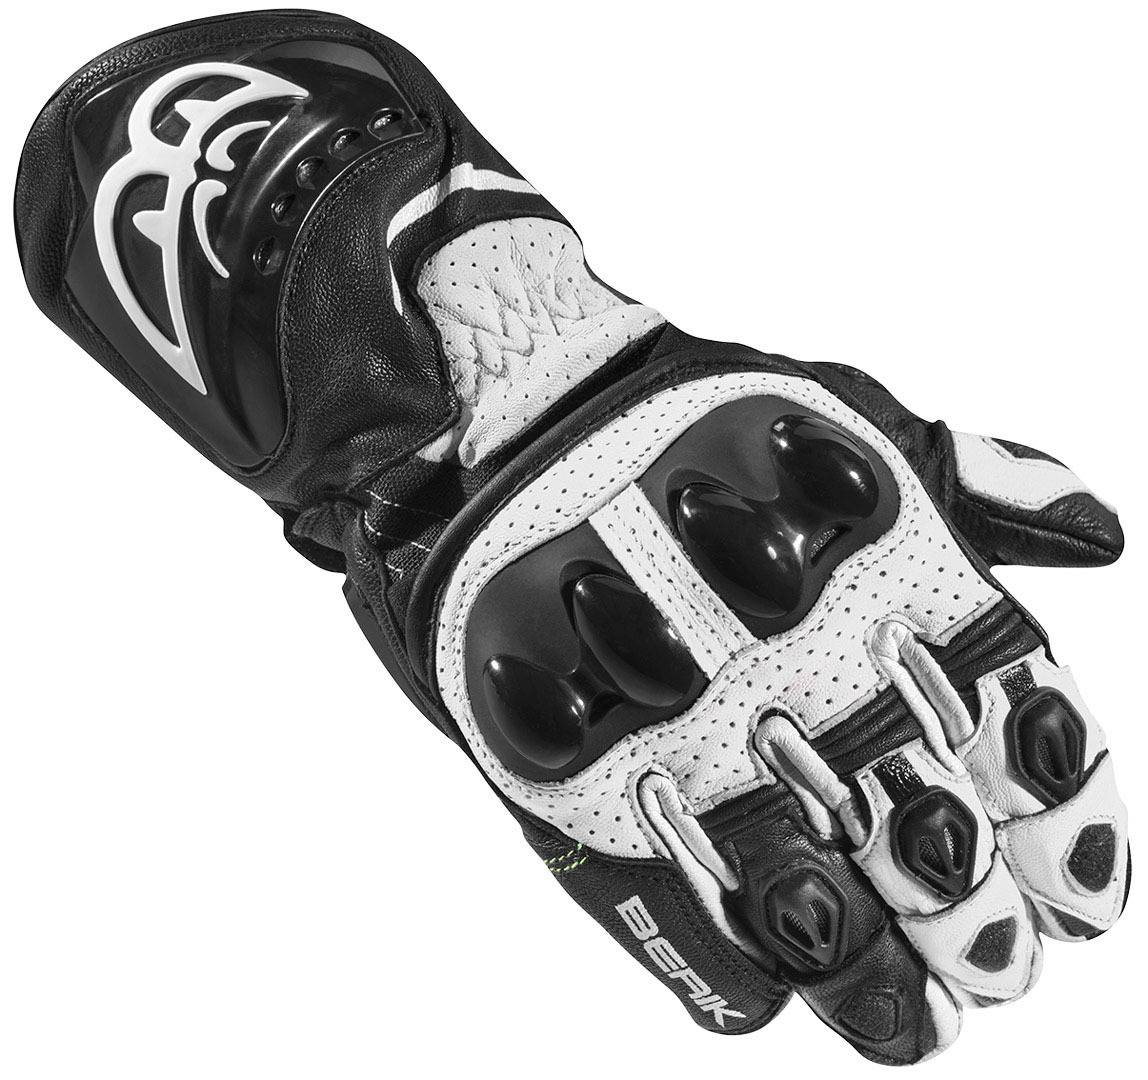 Berik Spa Evo Motorcykel handskar Svart Vit M